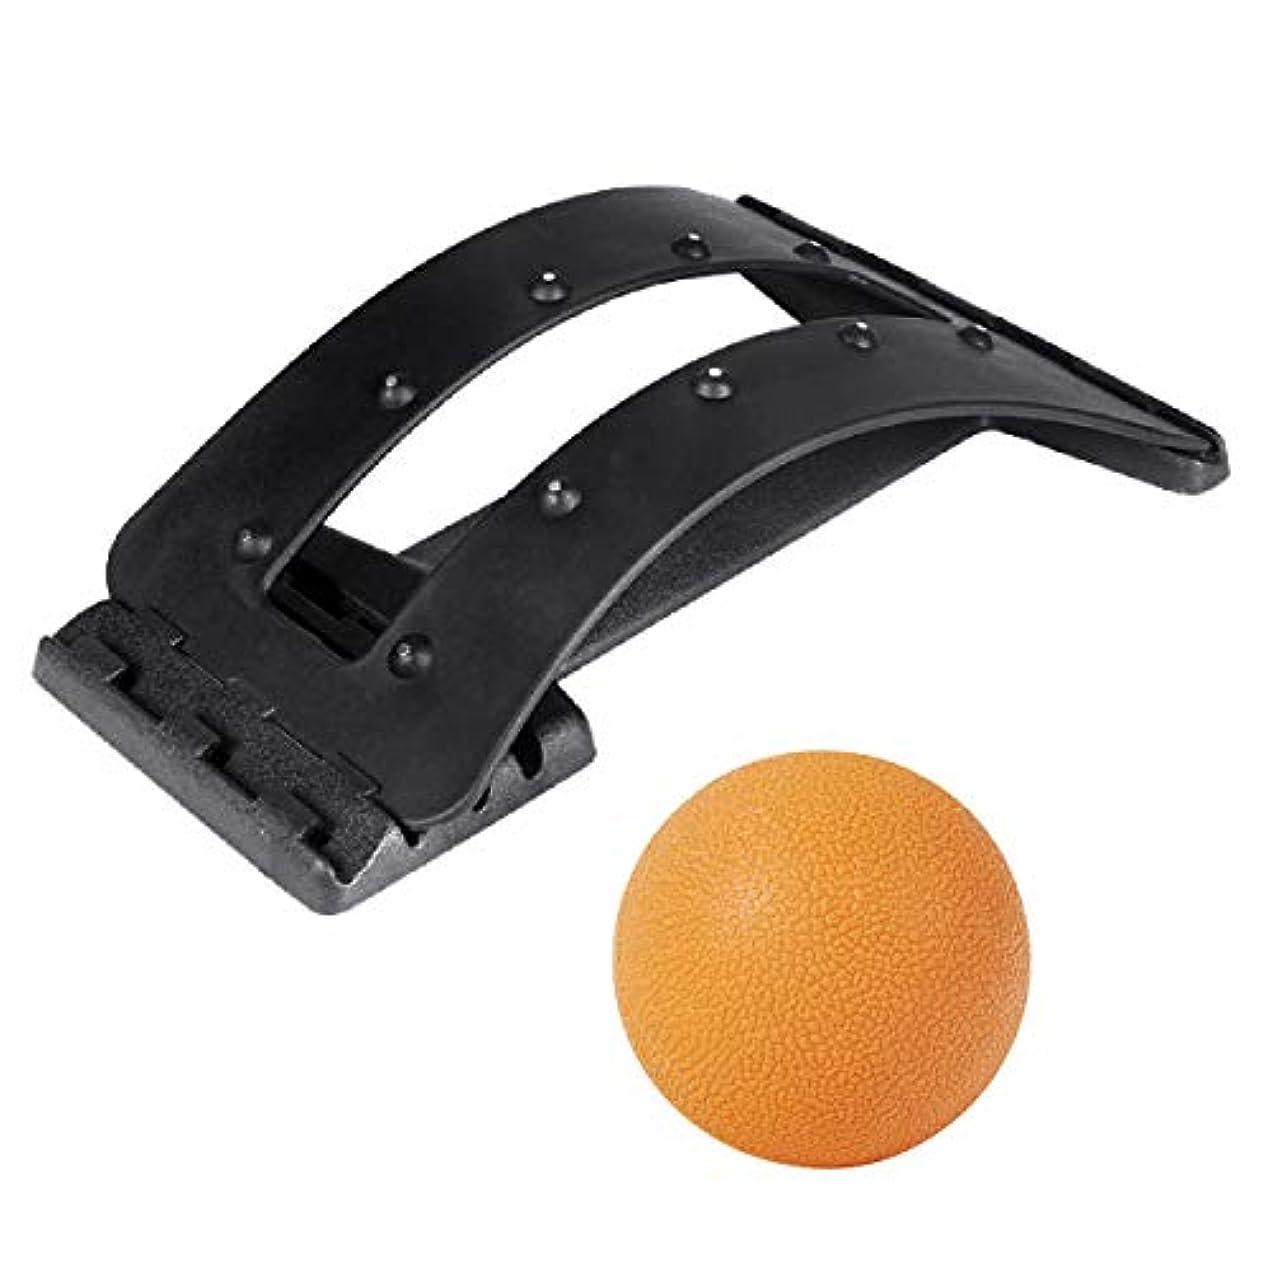 sac taske 背中 ストレッチ マッサージ ツボ押し ボード 背筋 腰痛対策 猫背 姿勢 矯正 (マッサージボール付き)